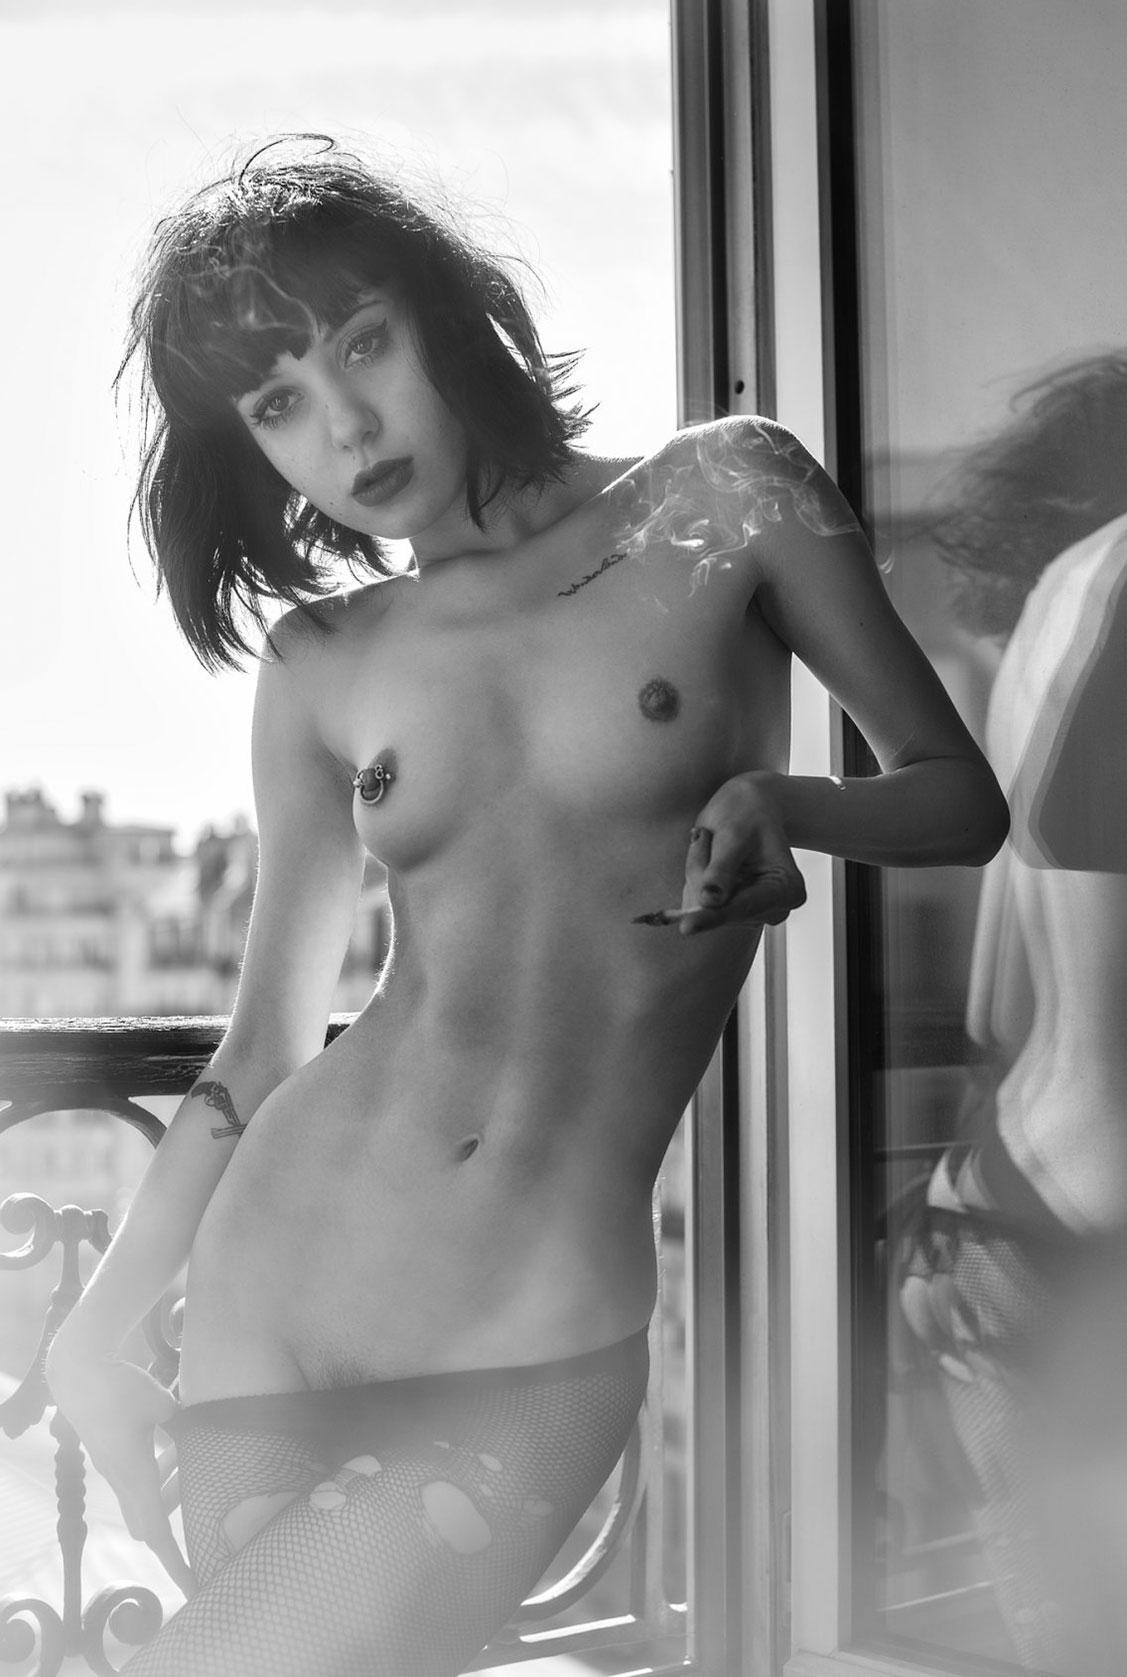 A la fenetre - nude photo by Mathieu Boutin